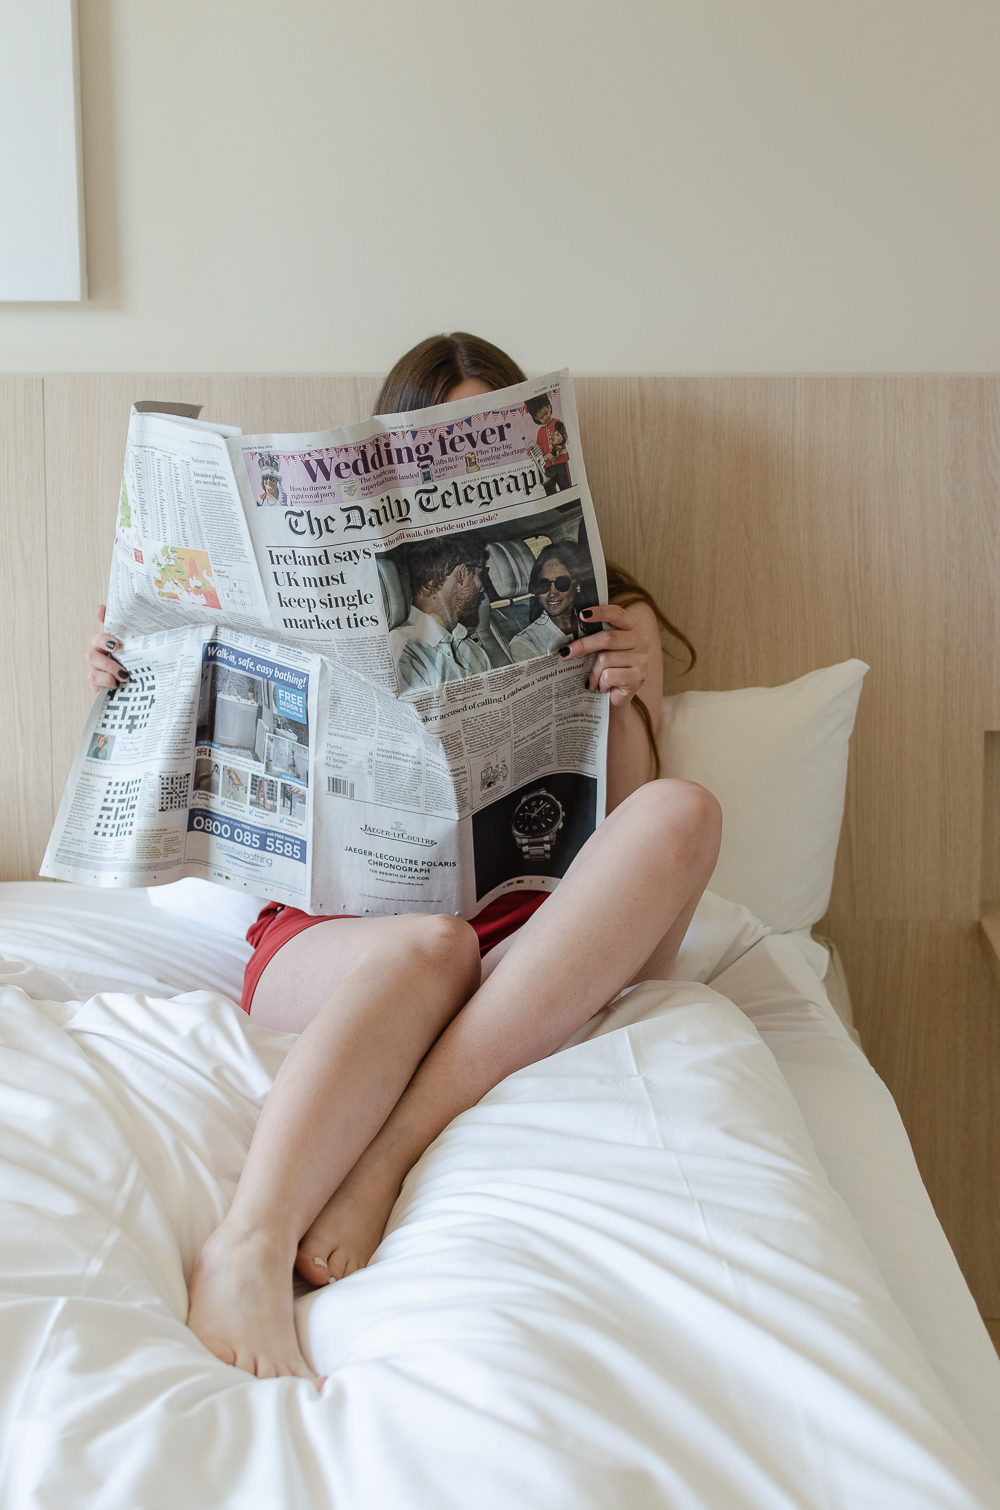 Angst vorm Bloggen-Abmahnwelle Blogger-Vreni Frost Abmahnung-EU Uploadfilter